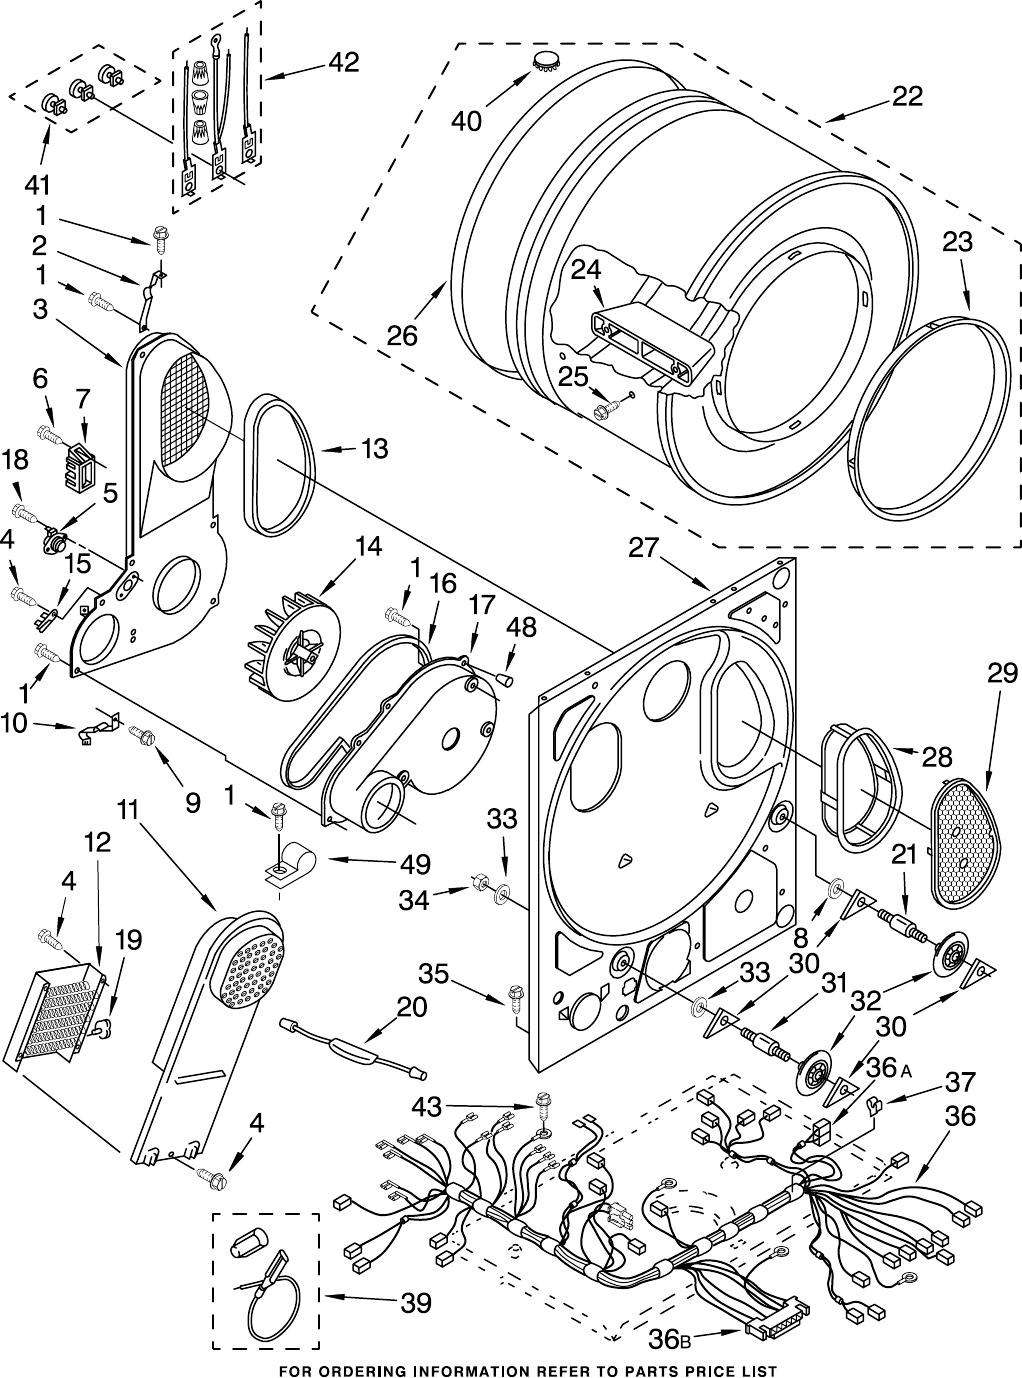 dryer bulkhead parts